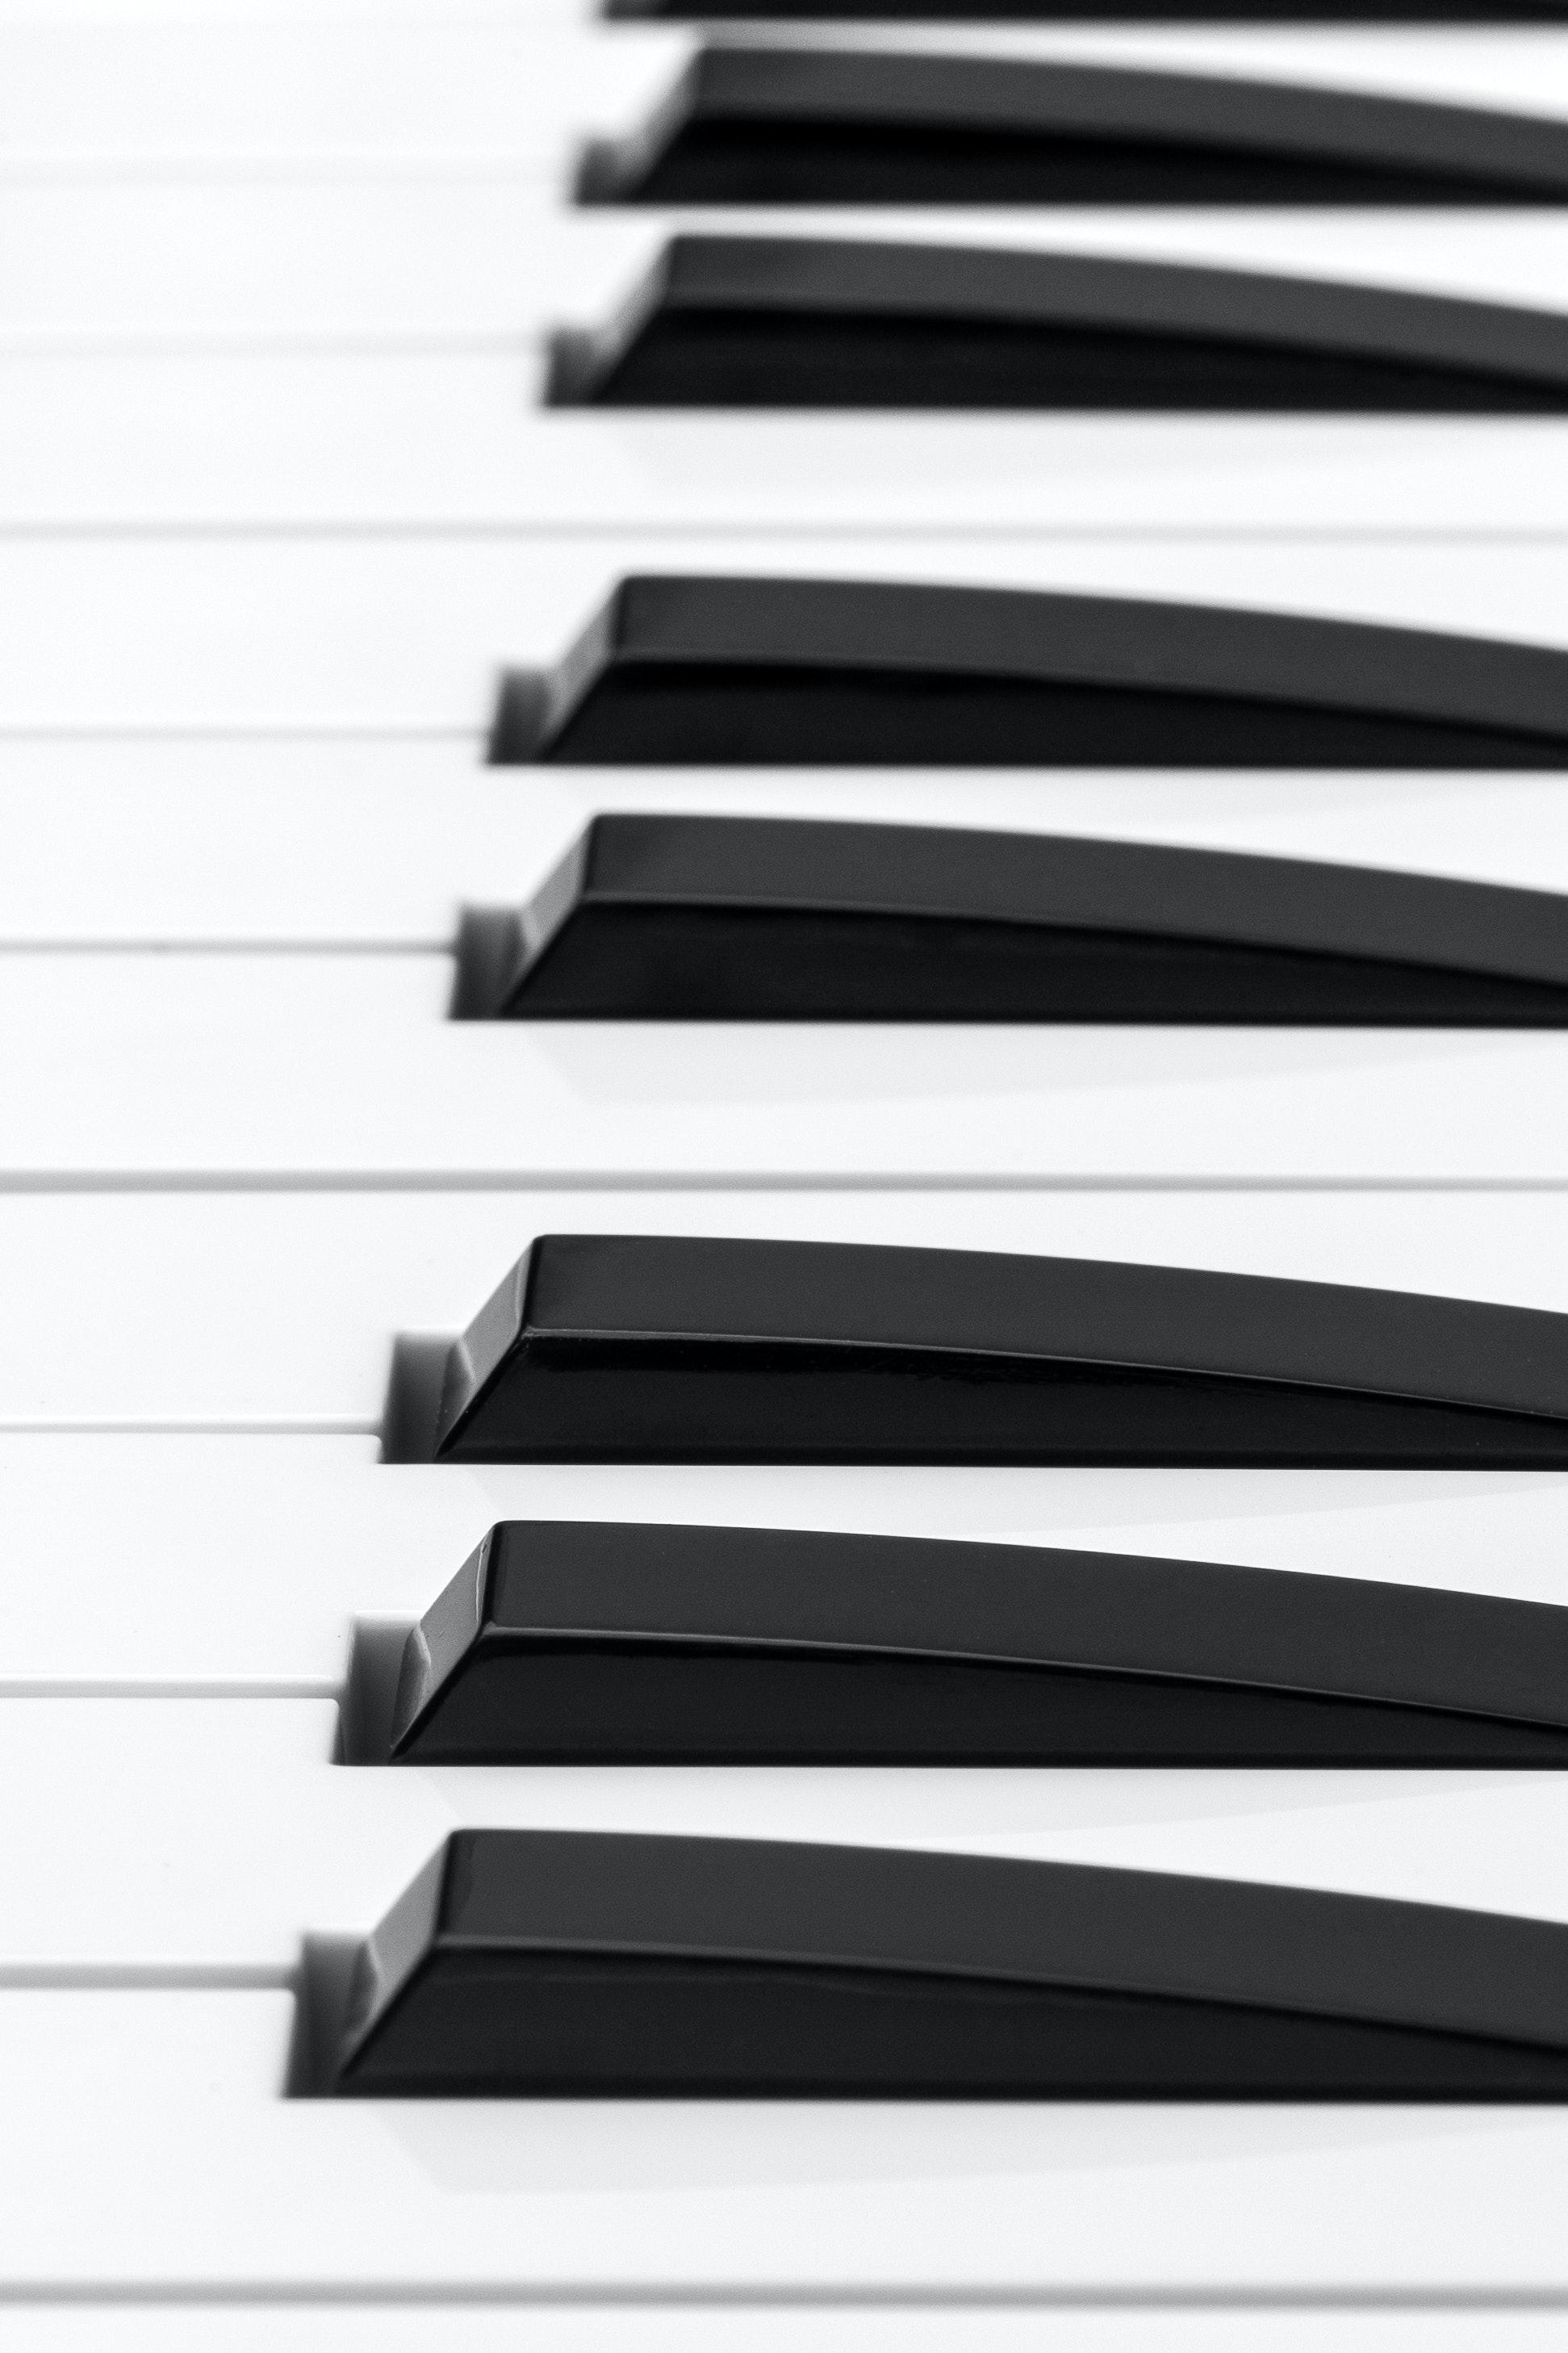 White and Black Piano Keys · Free Stock Photo